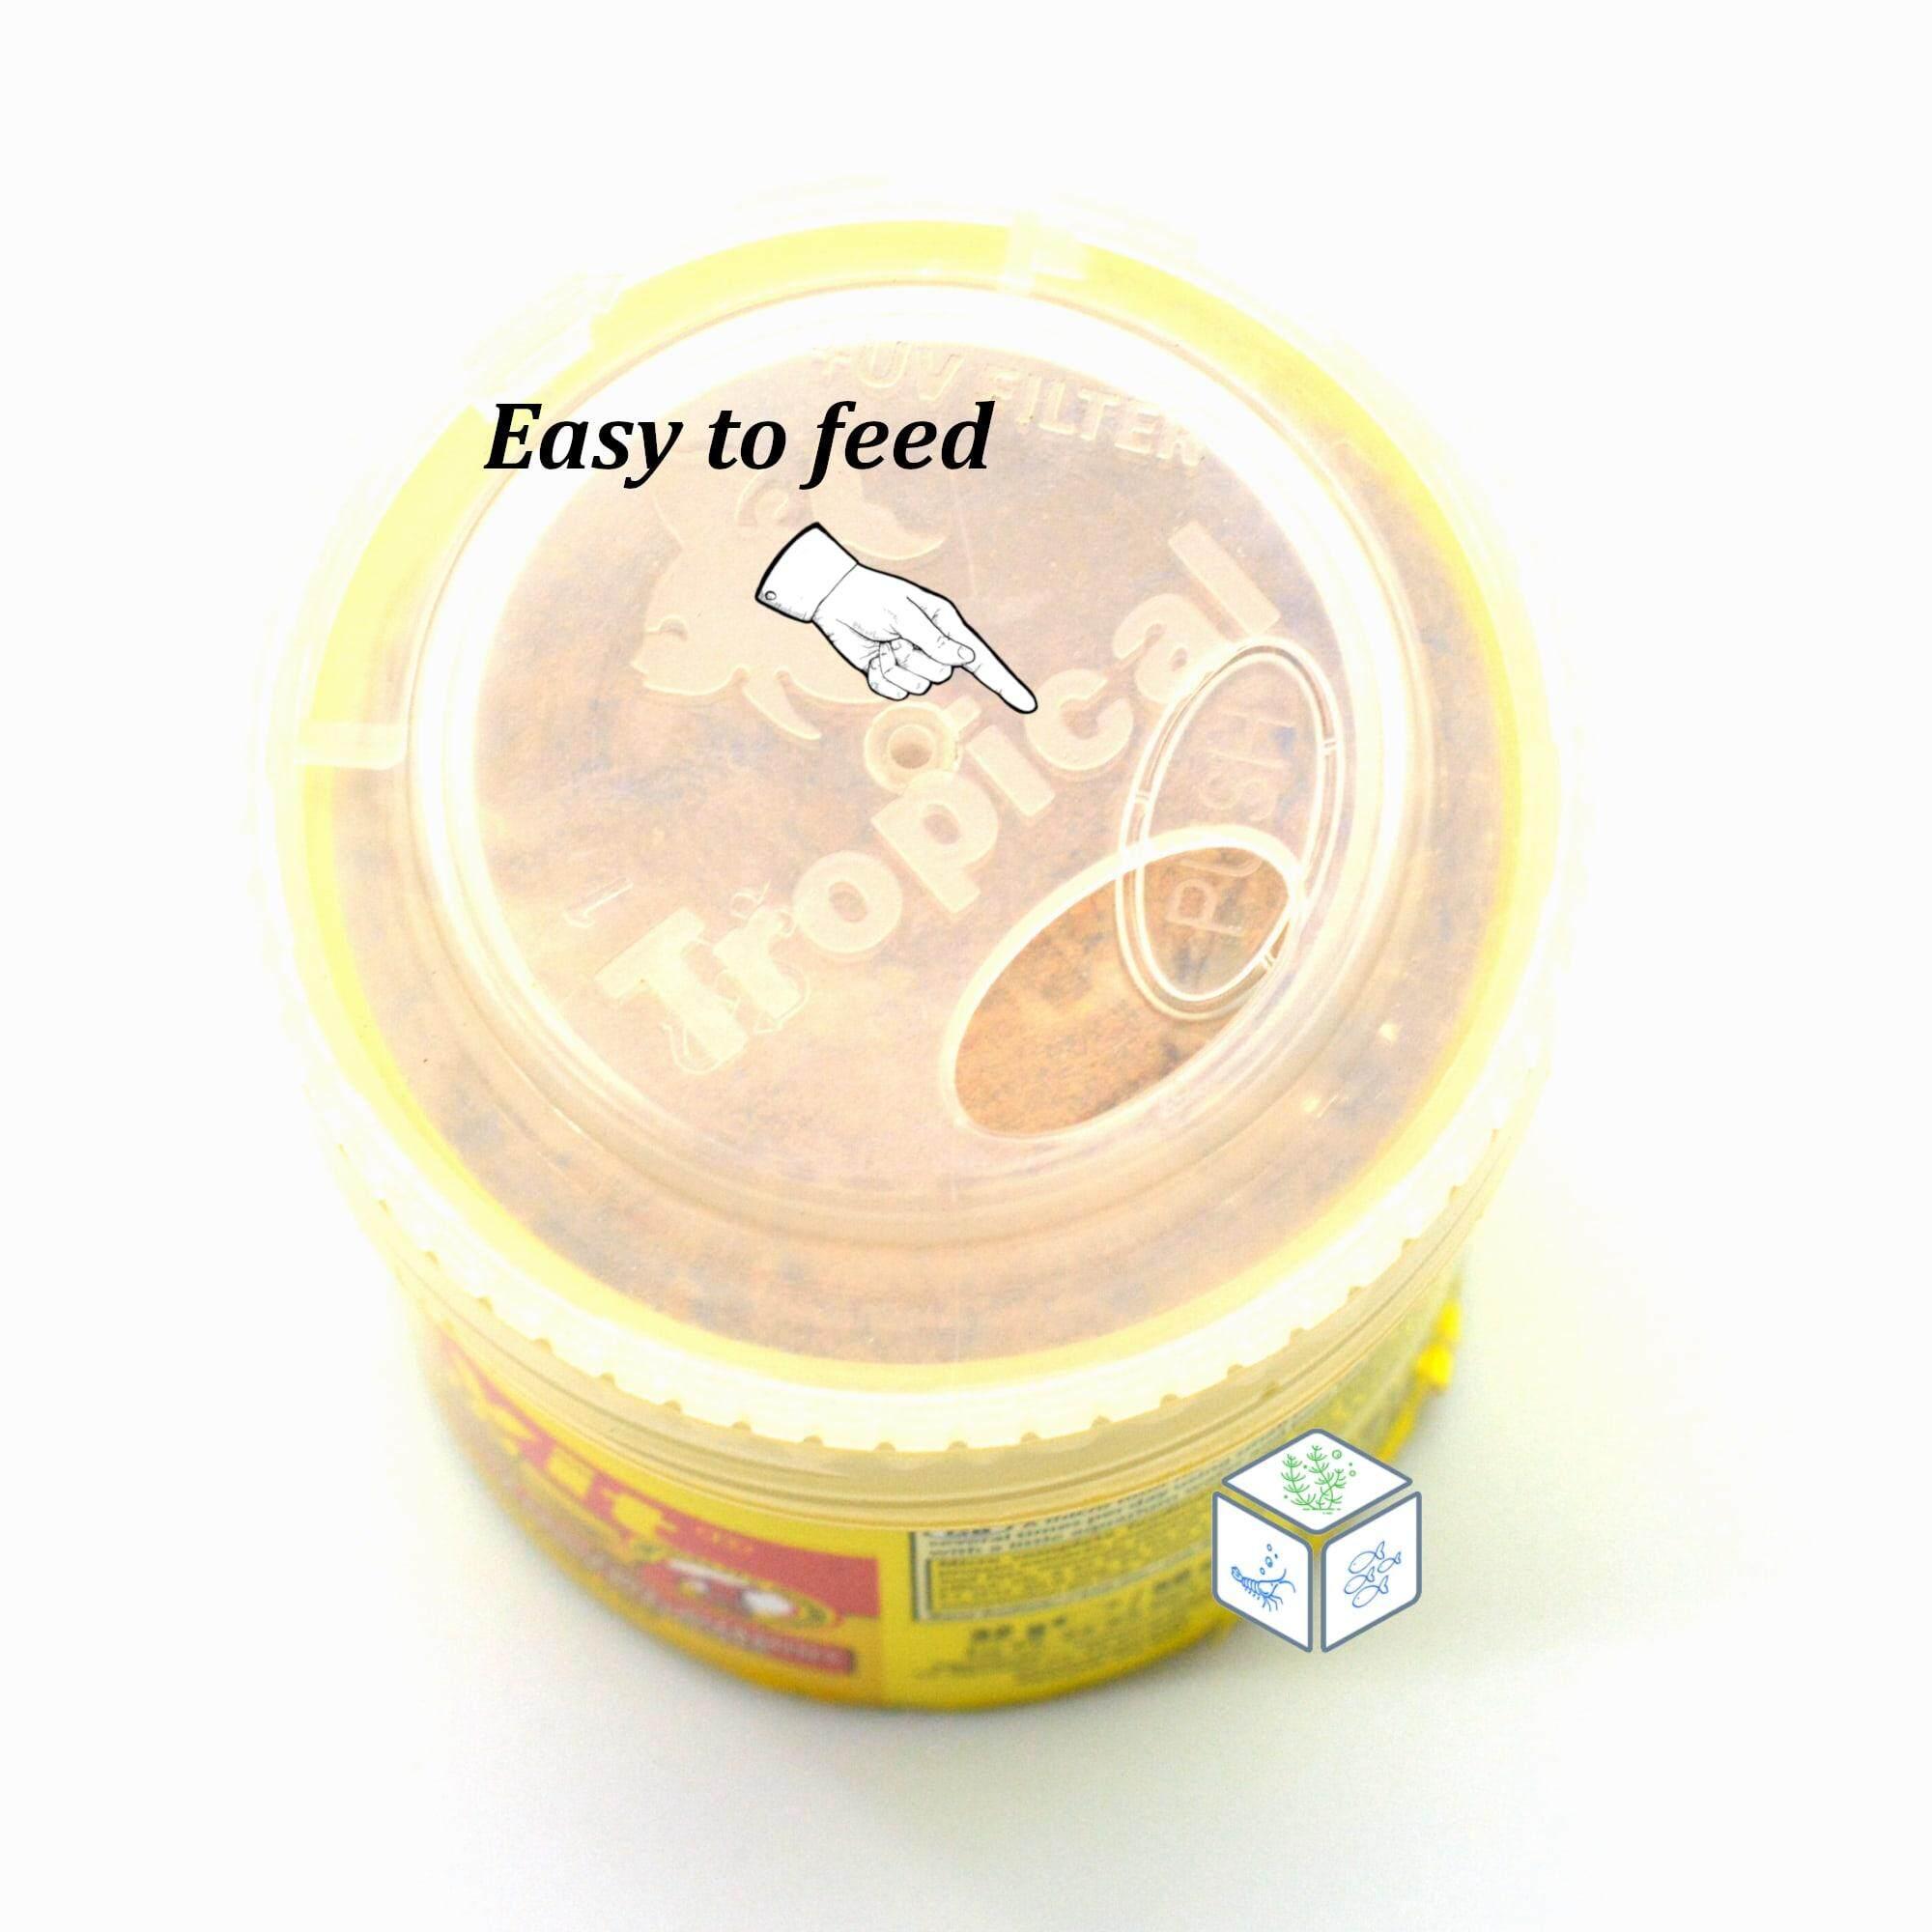 Tropical Mikrovit Hi-Protein 50ml (32g) Baby Fish Food